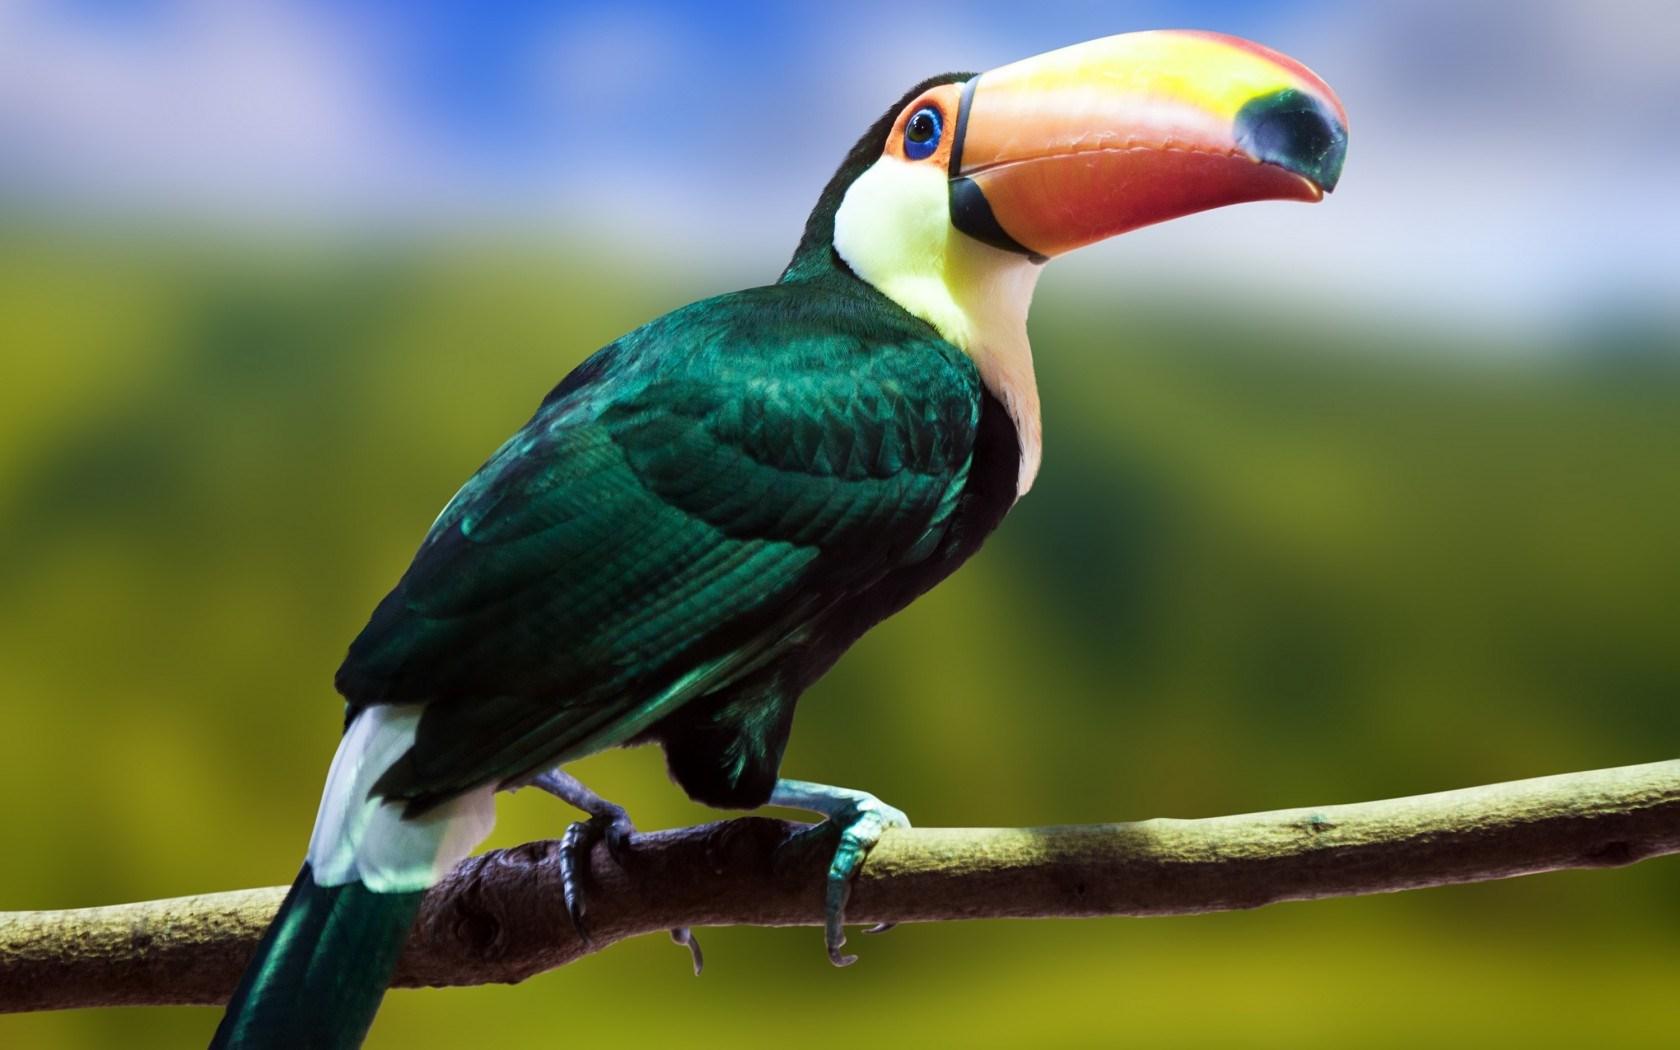 17 hd toucan bird wallpapers. Black Bedroom Furniture Sets. Home Design Ideas